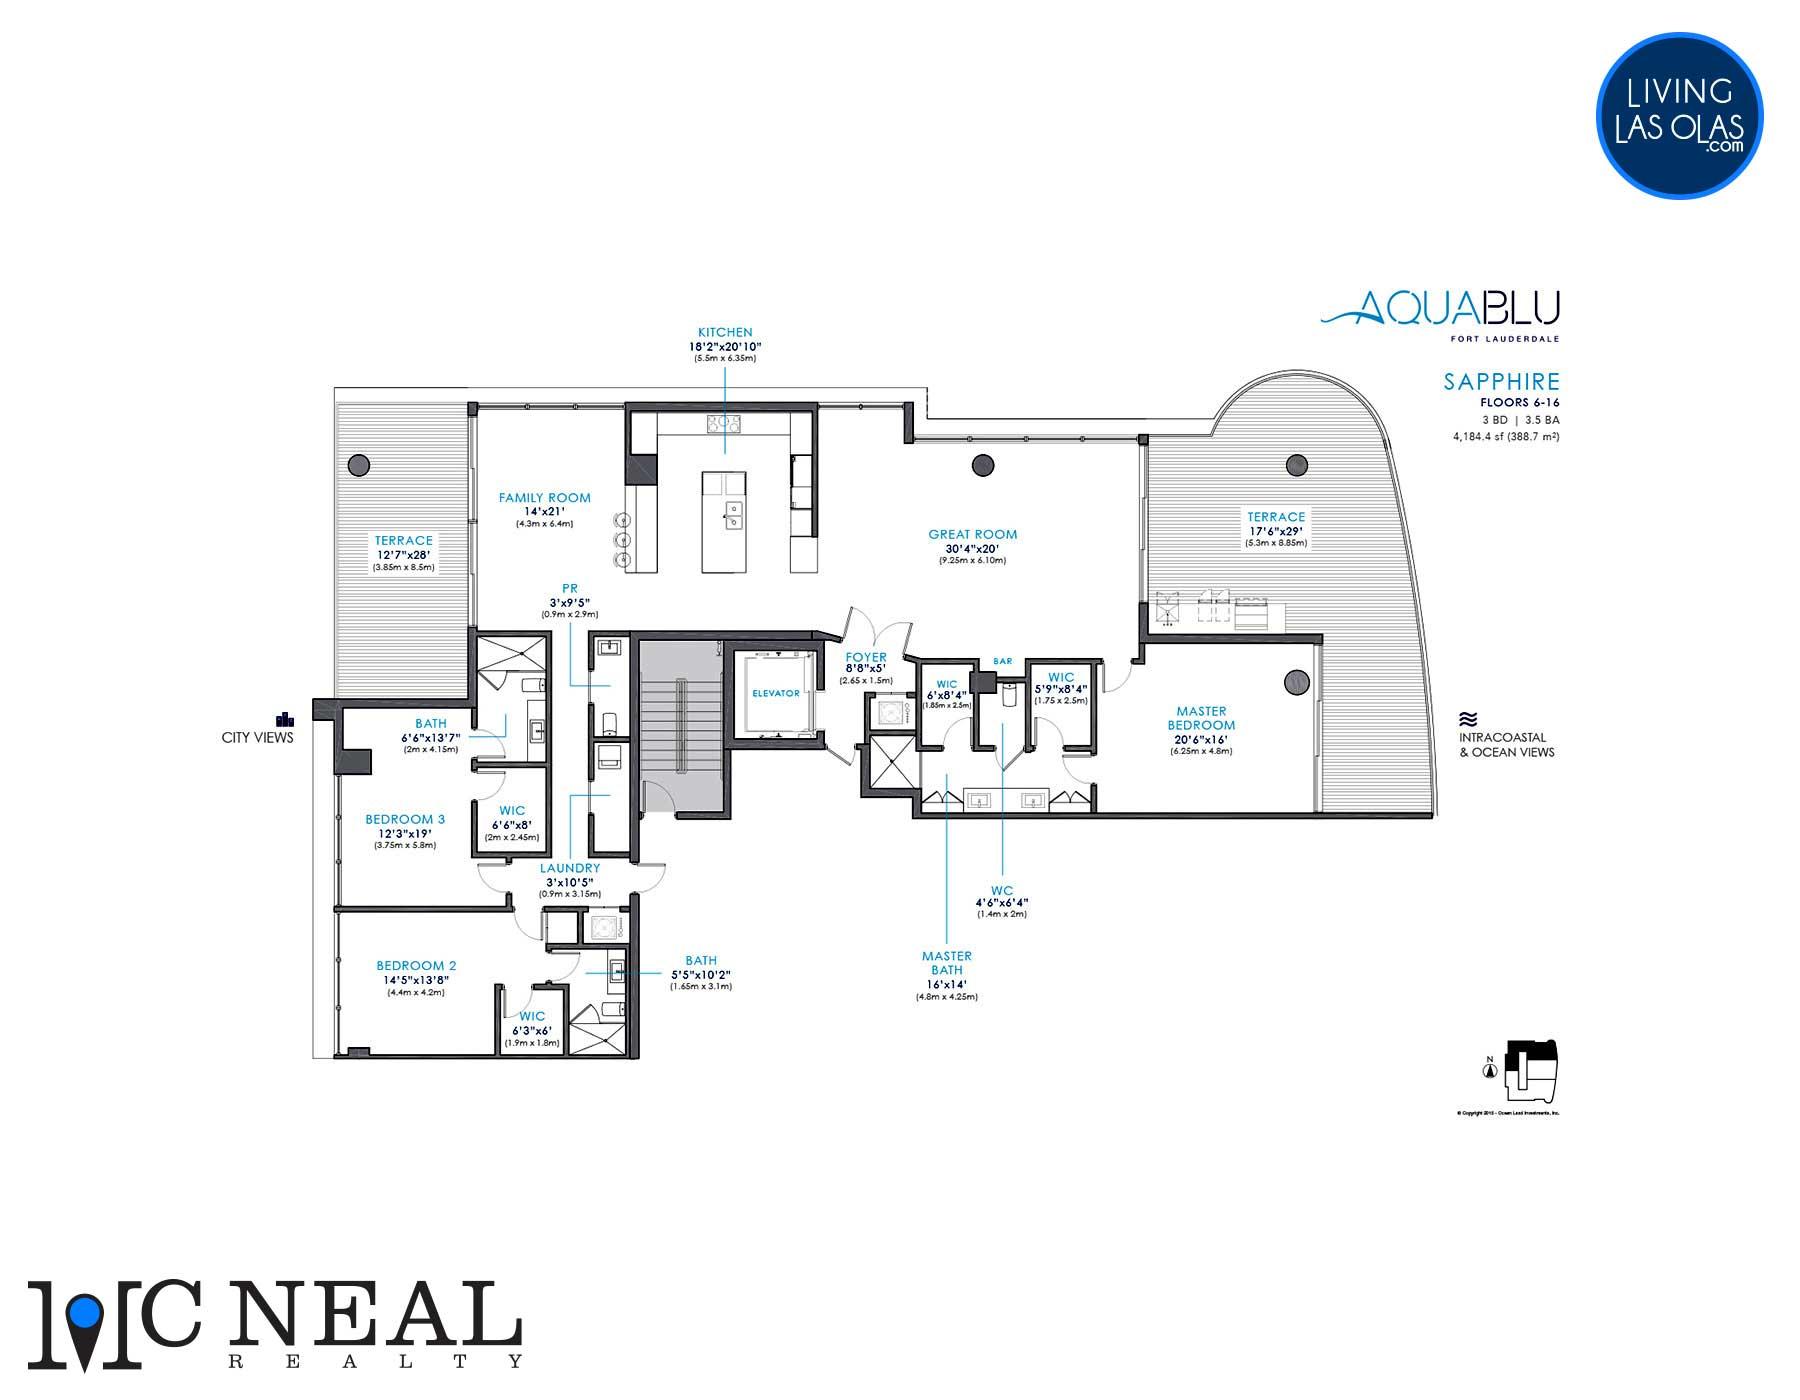 AquaBlu Fort Lauderdale Floor Plan Sapphire